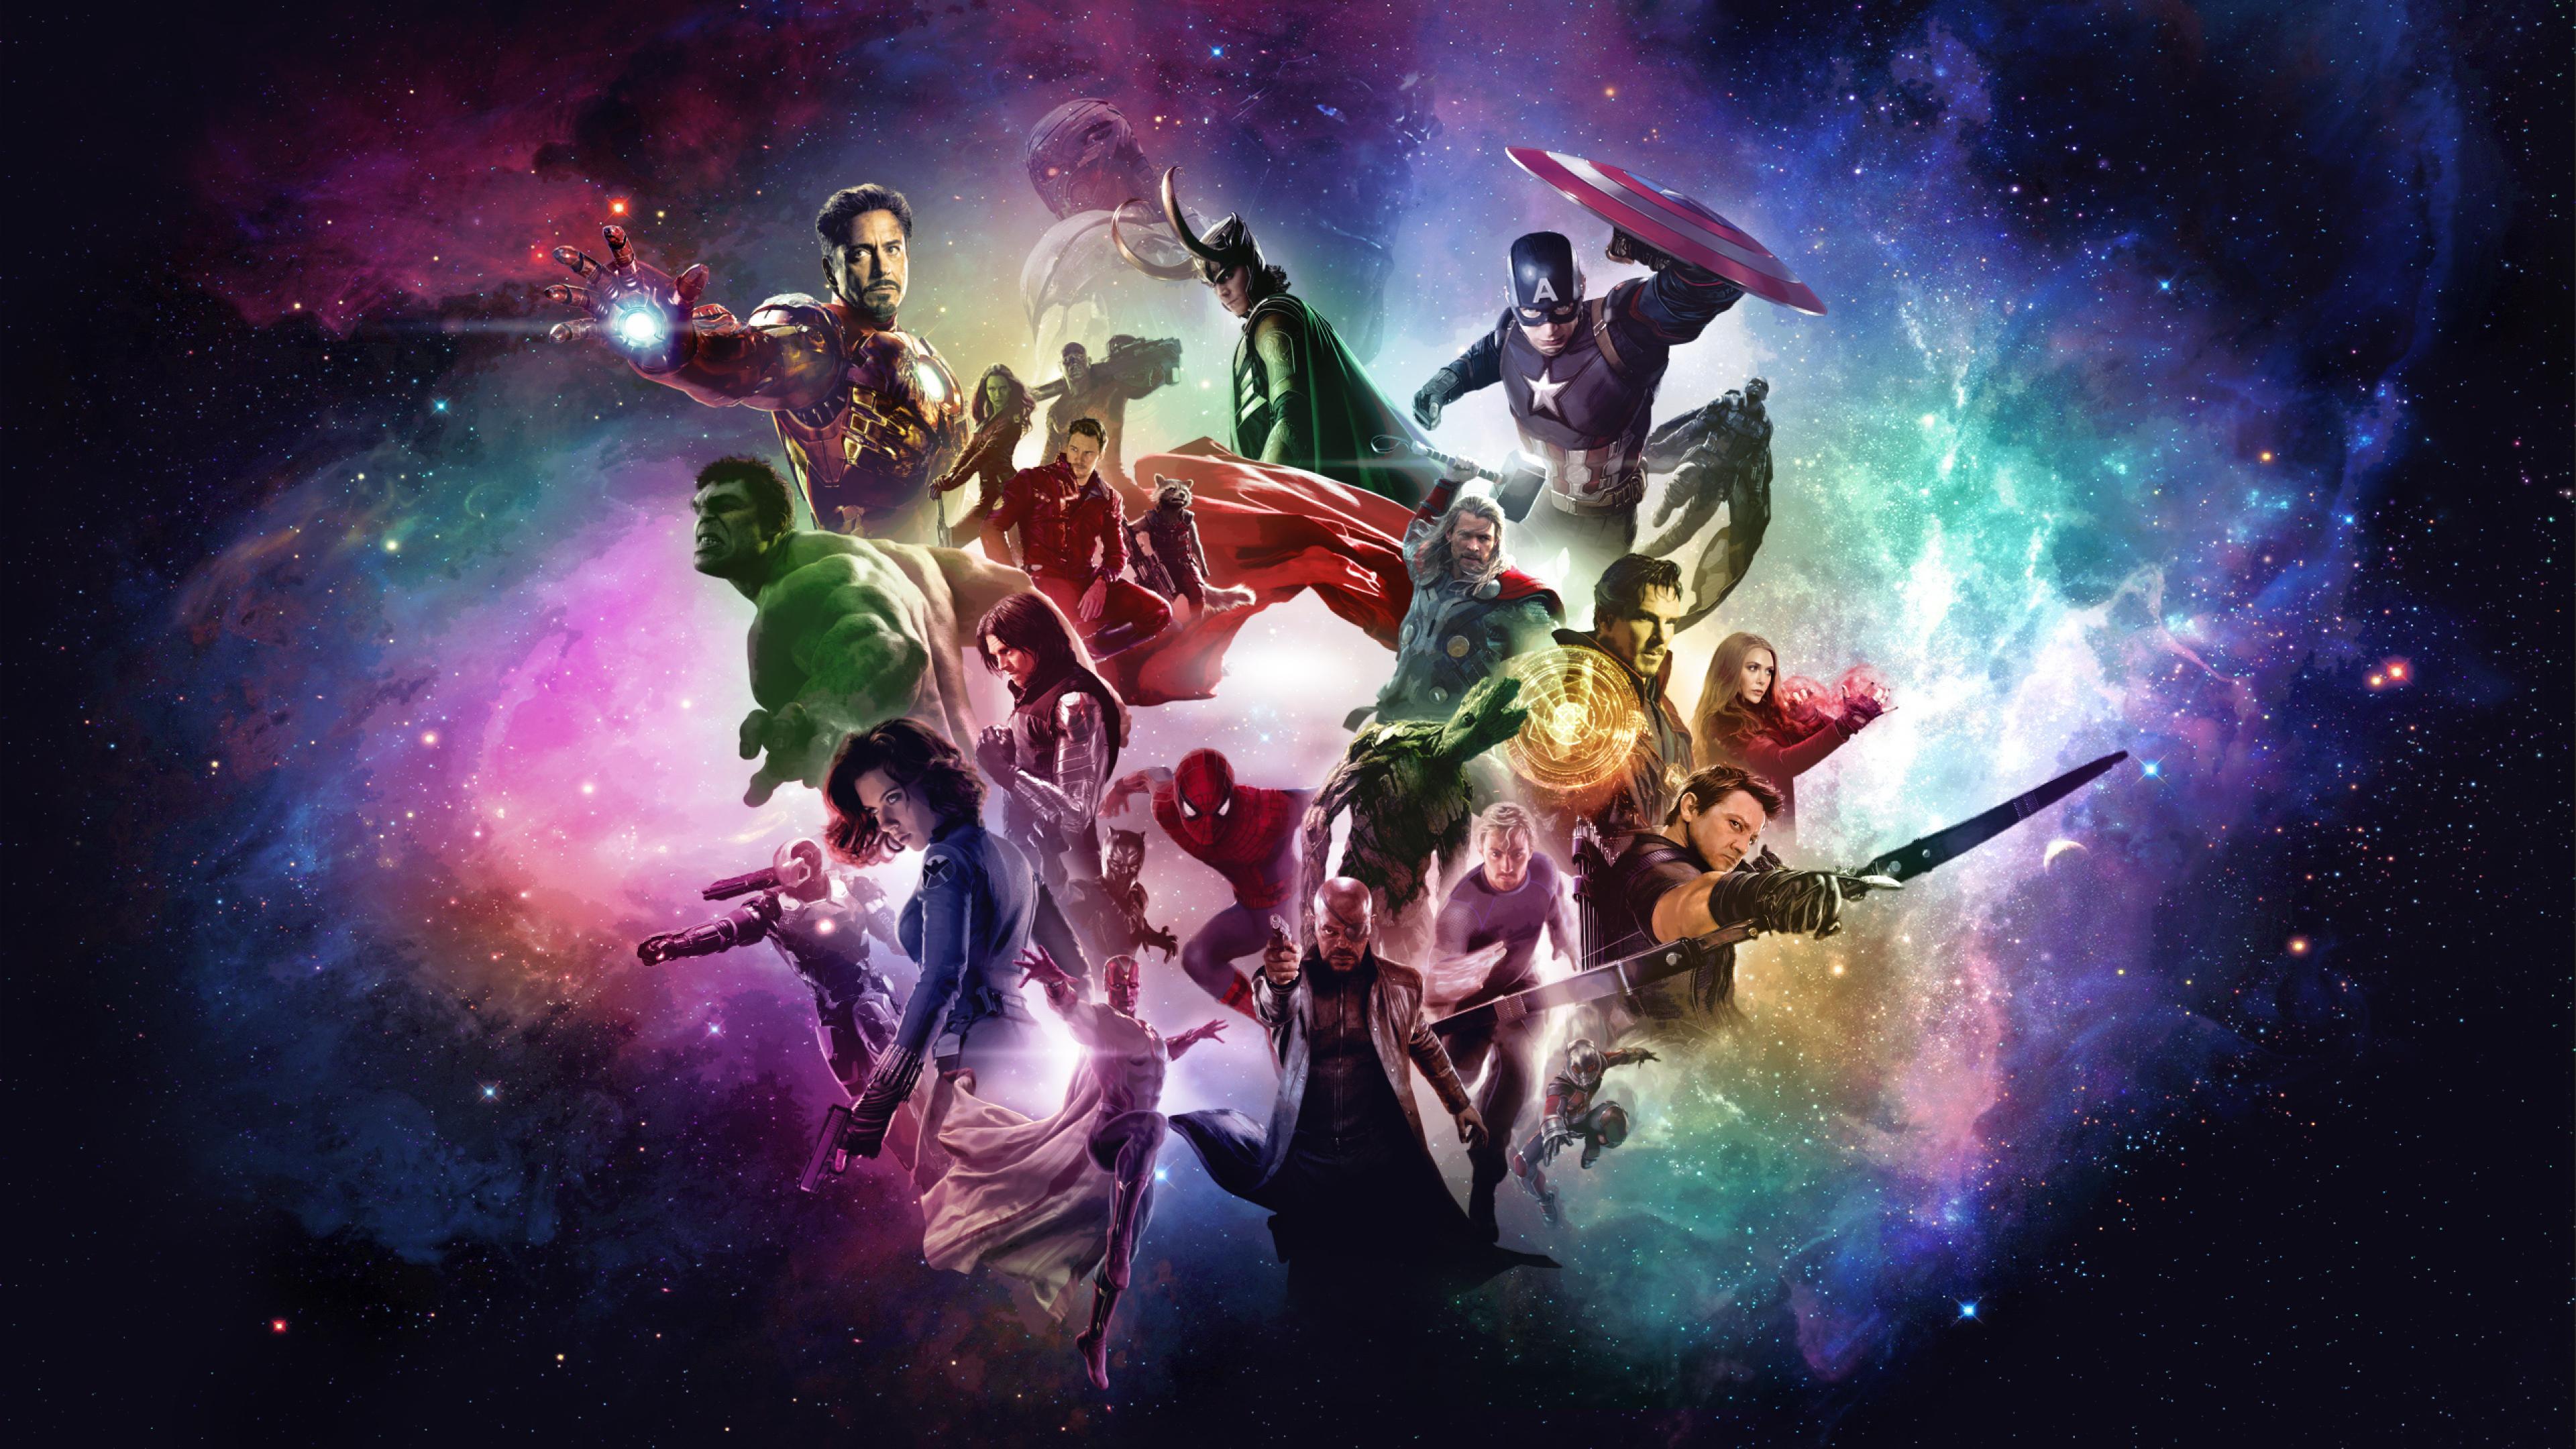 3840x2160 Marvel Studios Avengers 4K Wallpaper, HD Movies ...